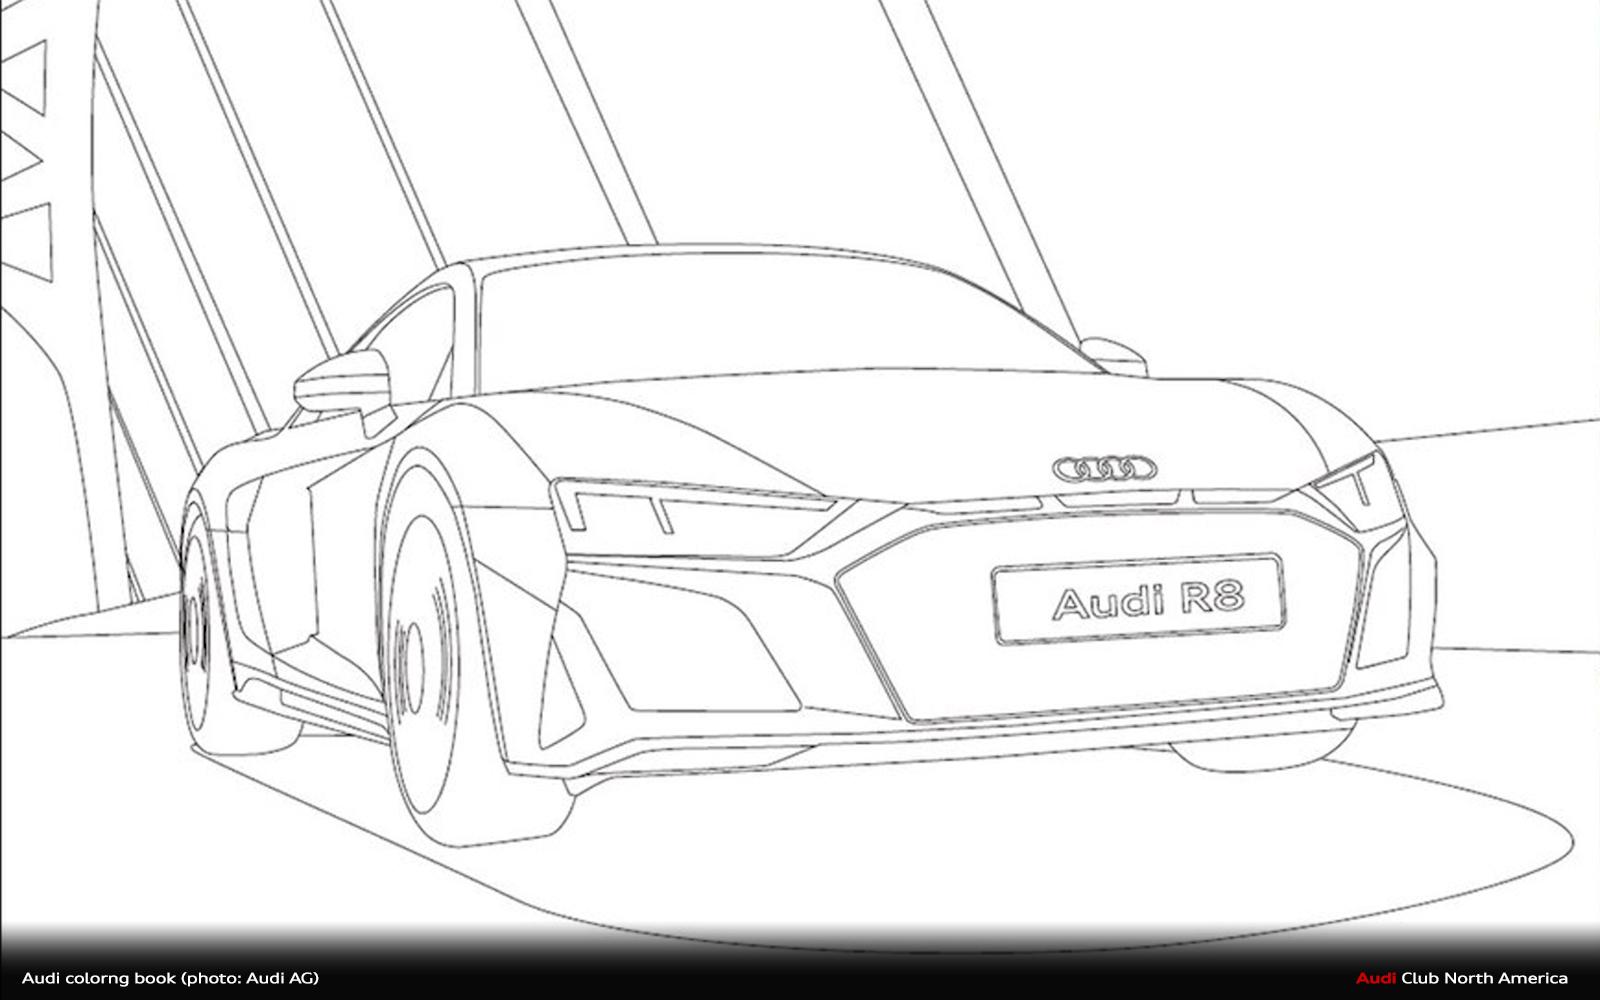 Kleurplaat Auto Audi Q8 Kolorowanki Audi Do Druku Dla Dzieci I Doroslych Auto Kleurplaat Audi Mercedes Glk Gratis Malvorlage In Autos2 Transportmittel